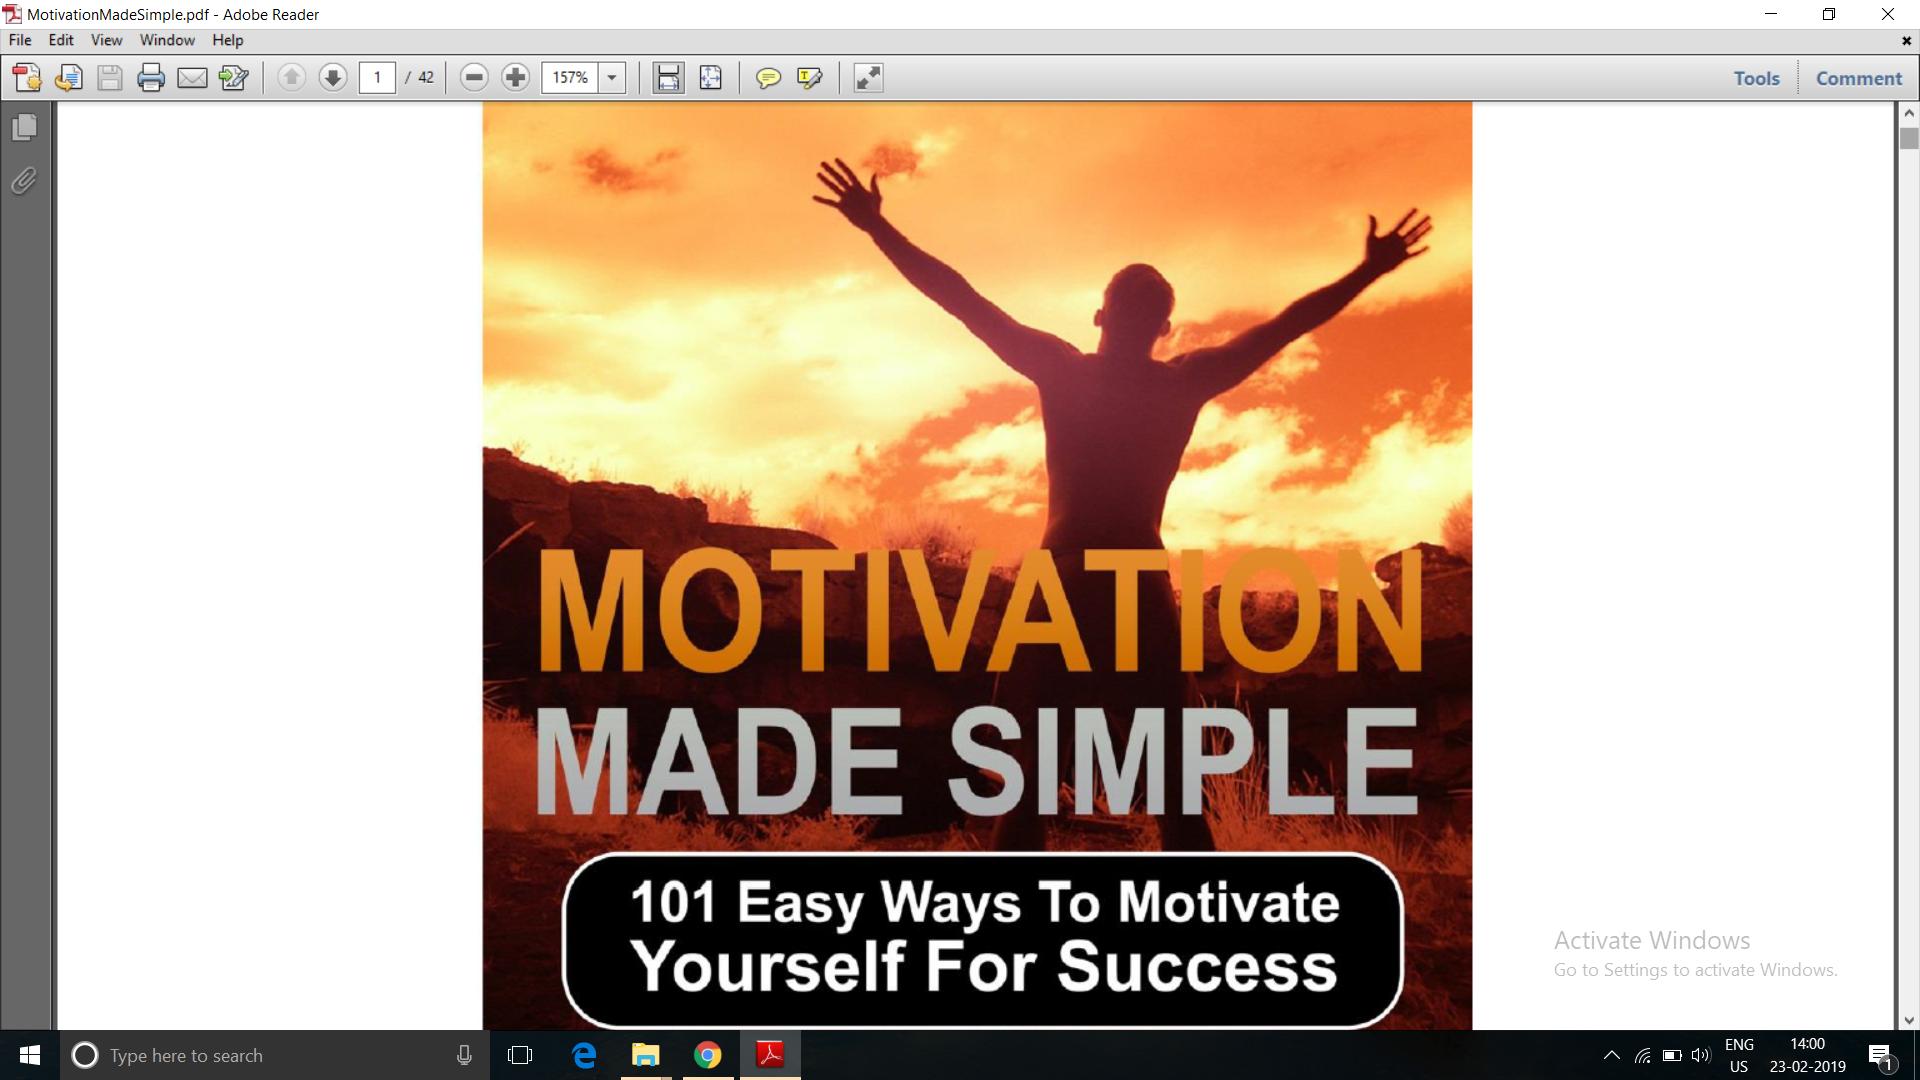 Motivation Made Simple eBook